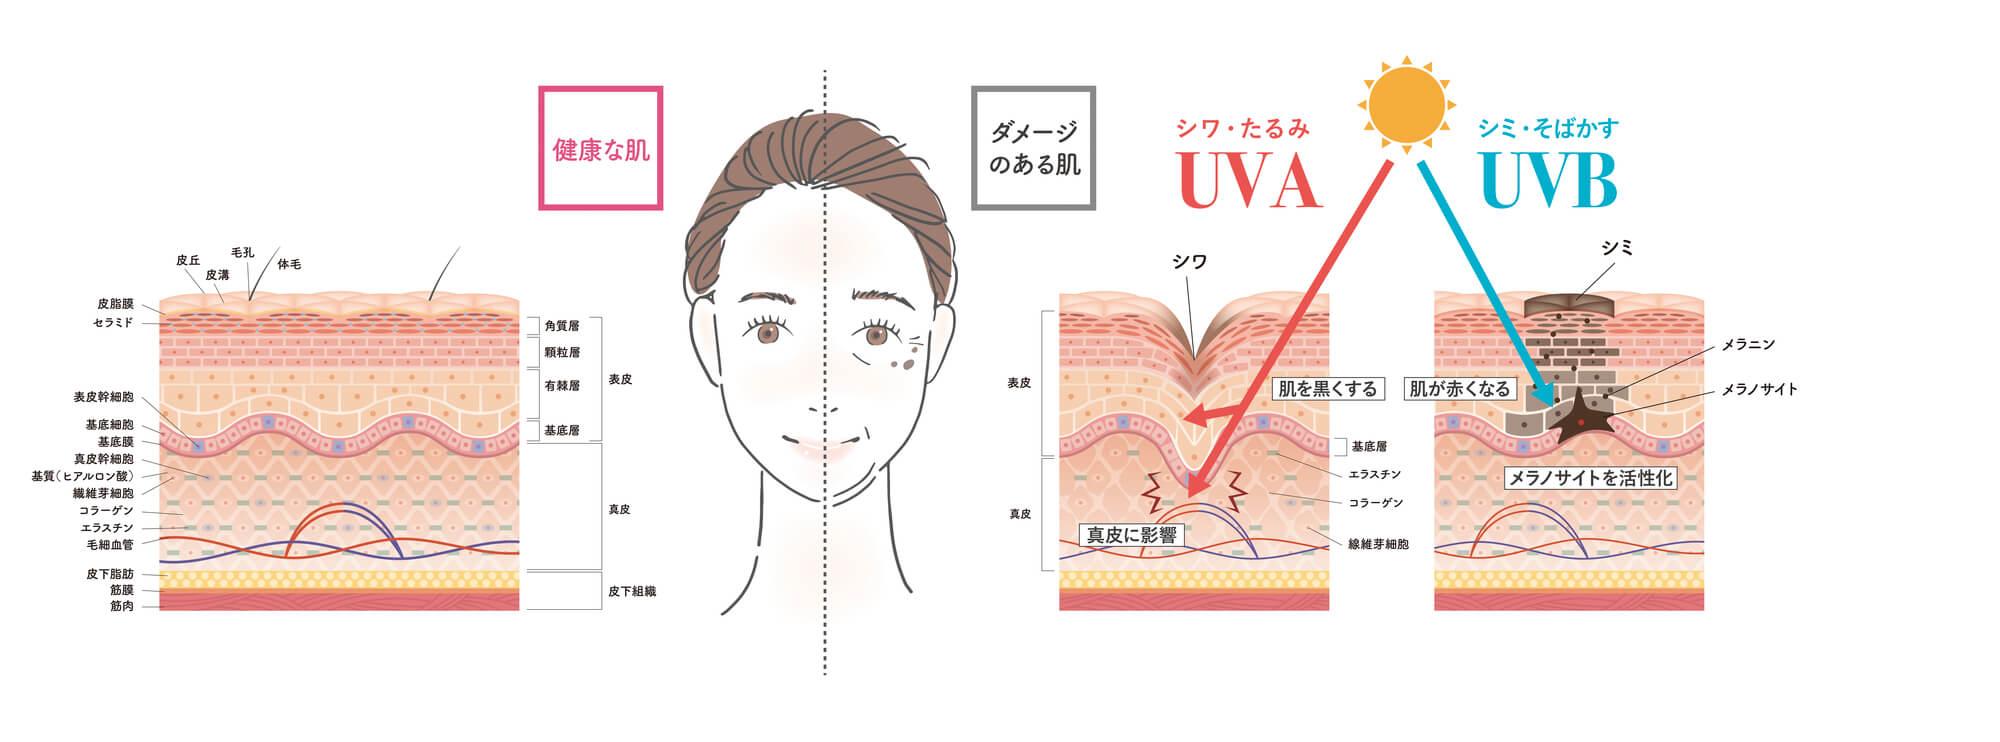 UVAUVBの影響